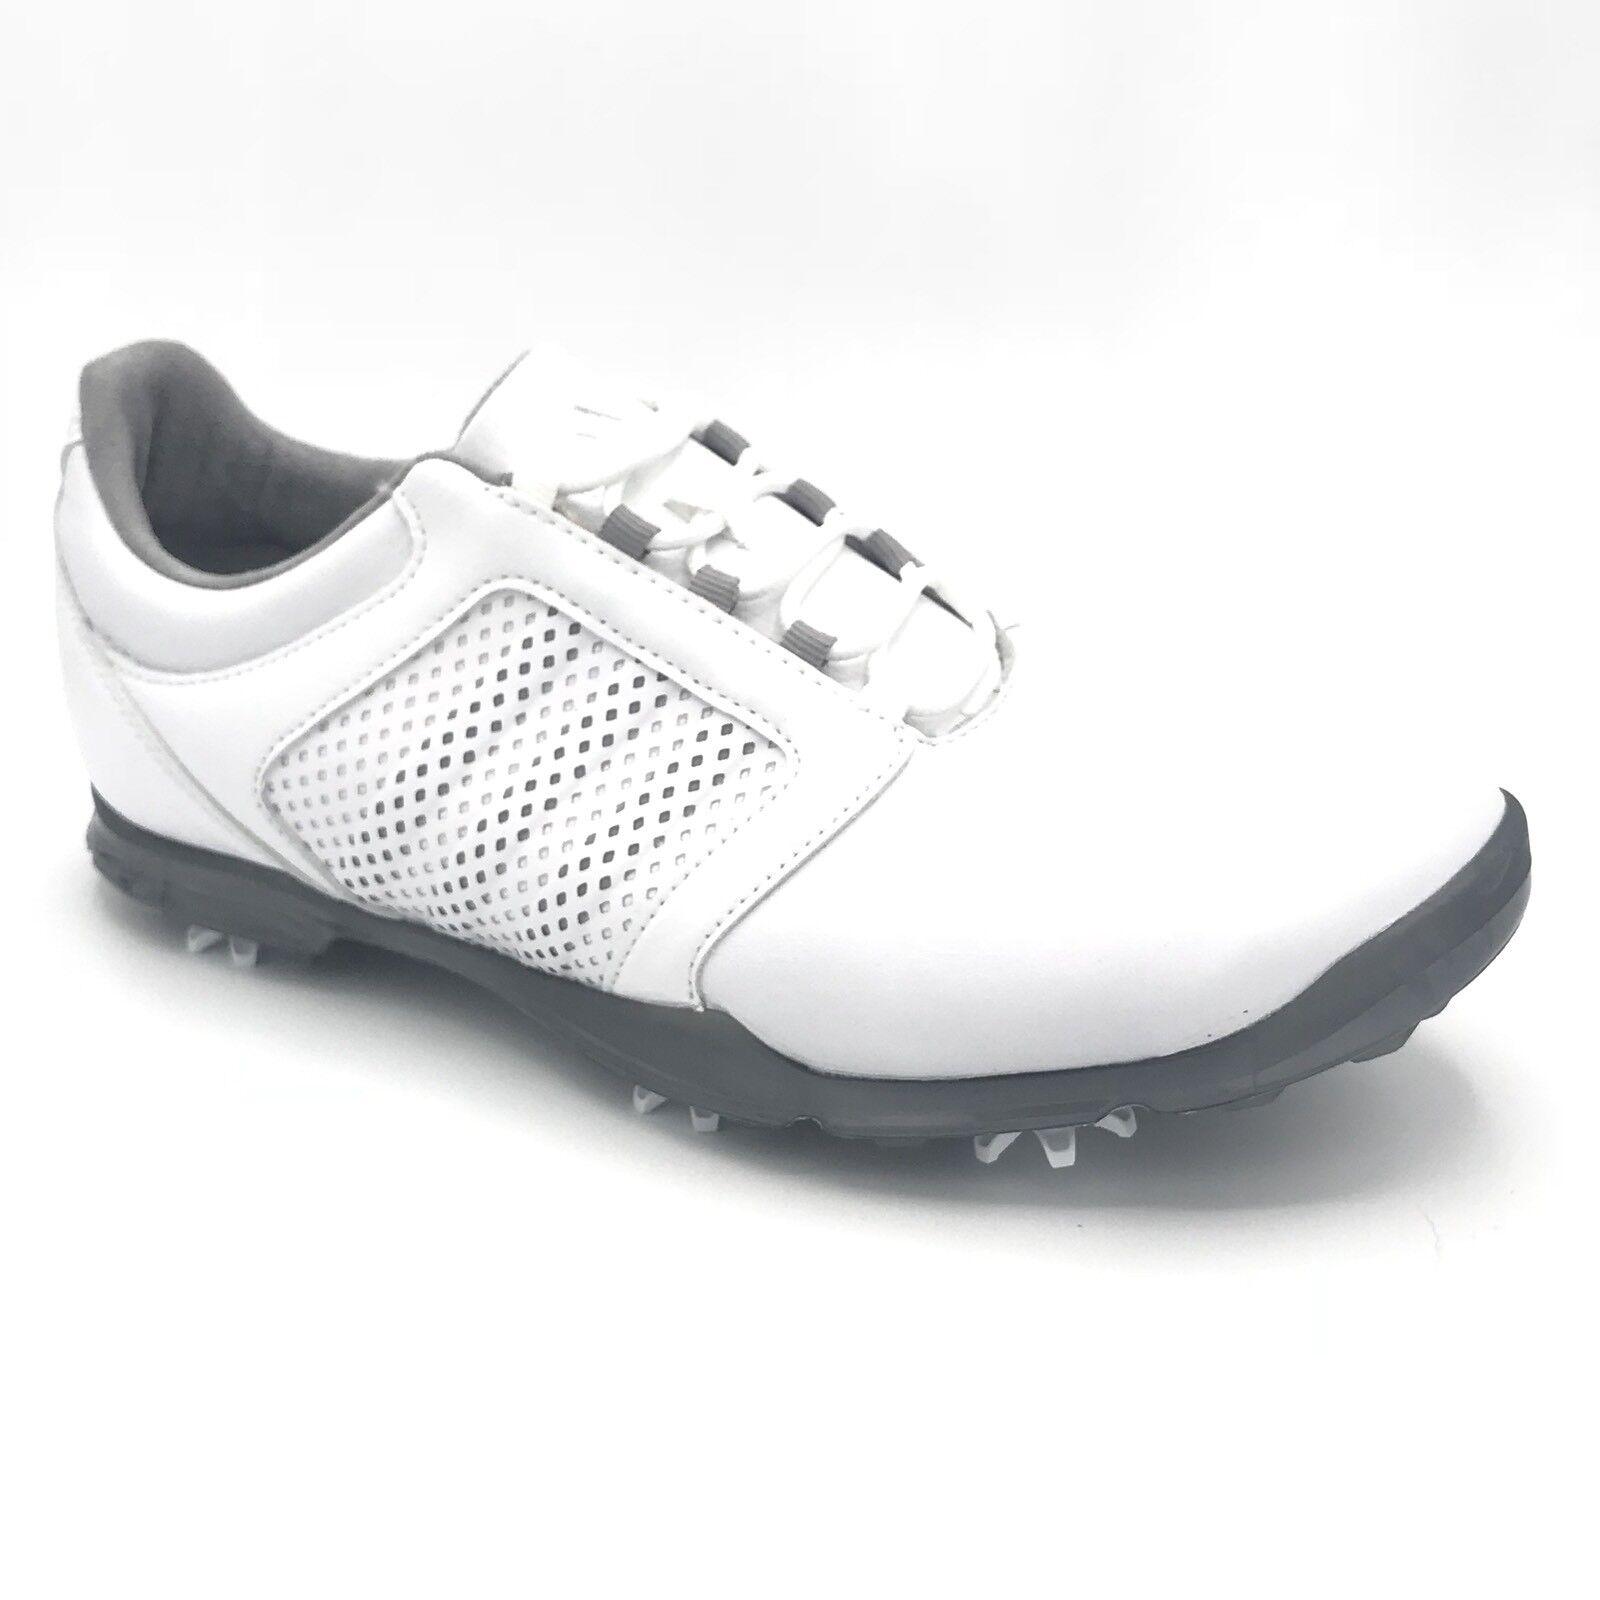 Adidas q44871 signore adipure tour golf, scarpe da golf, tour bianco, dimensioni 9.5 0bcb23